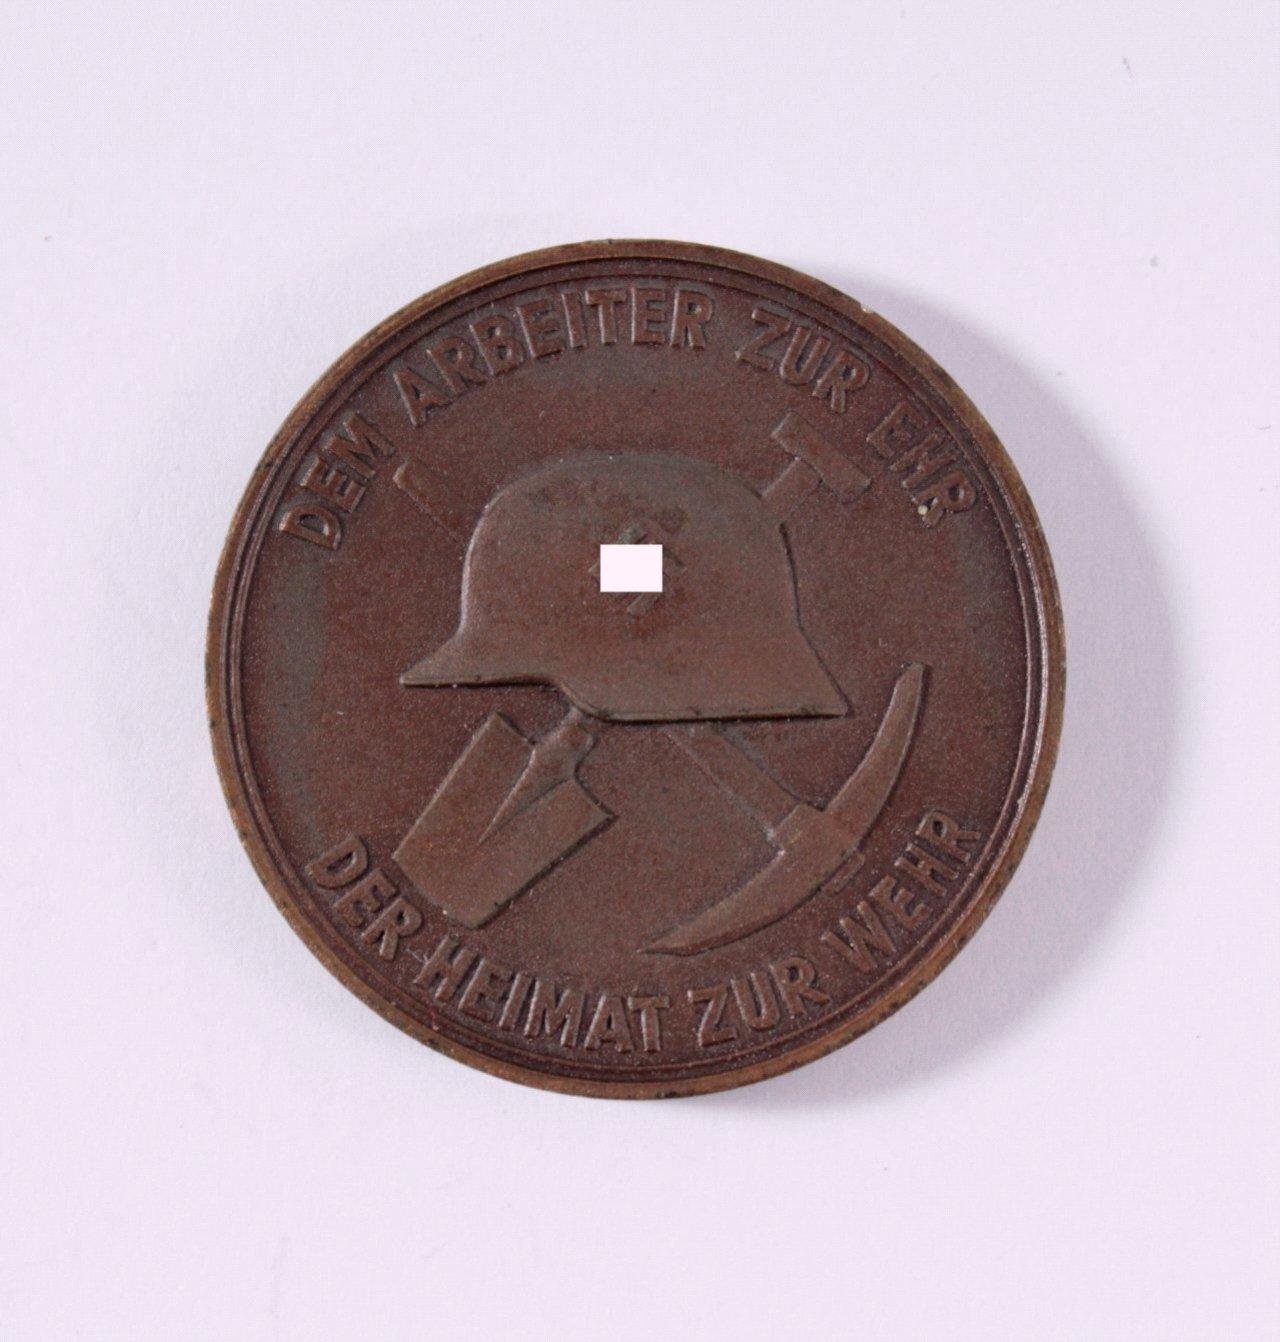 Medaille Philipp Holzmann, Freiburg i/B. 1938-1